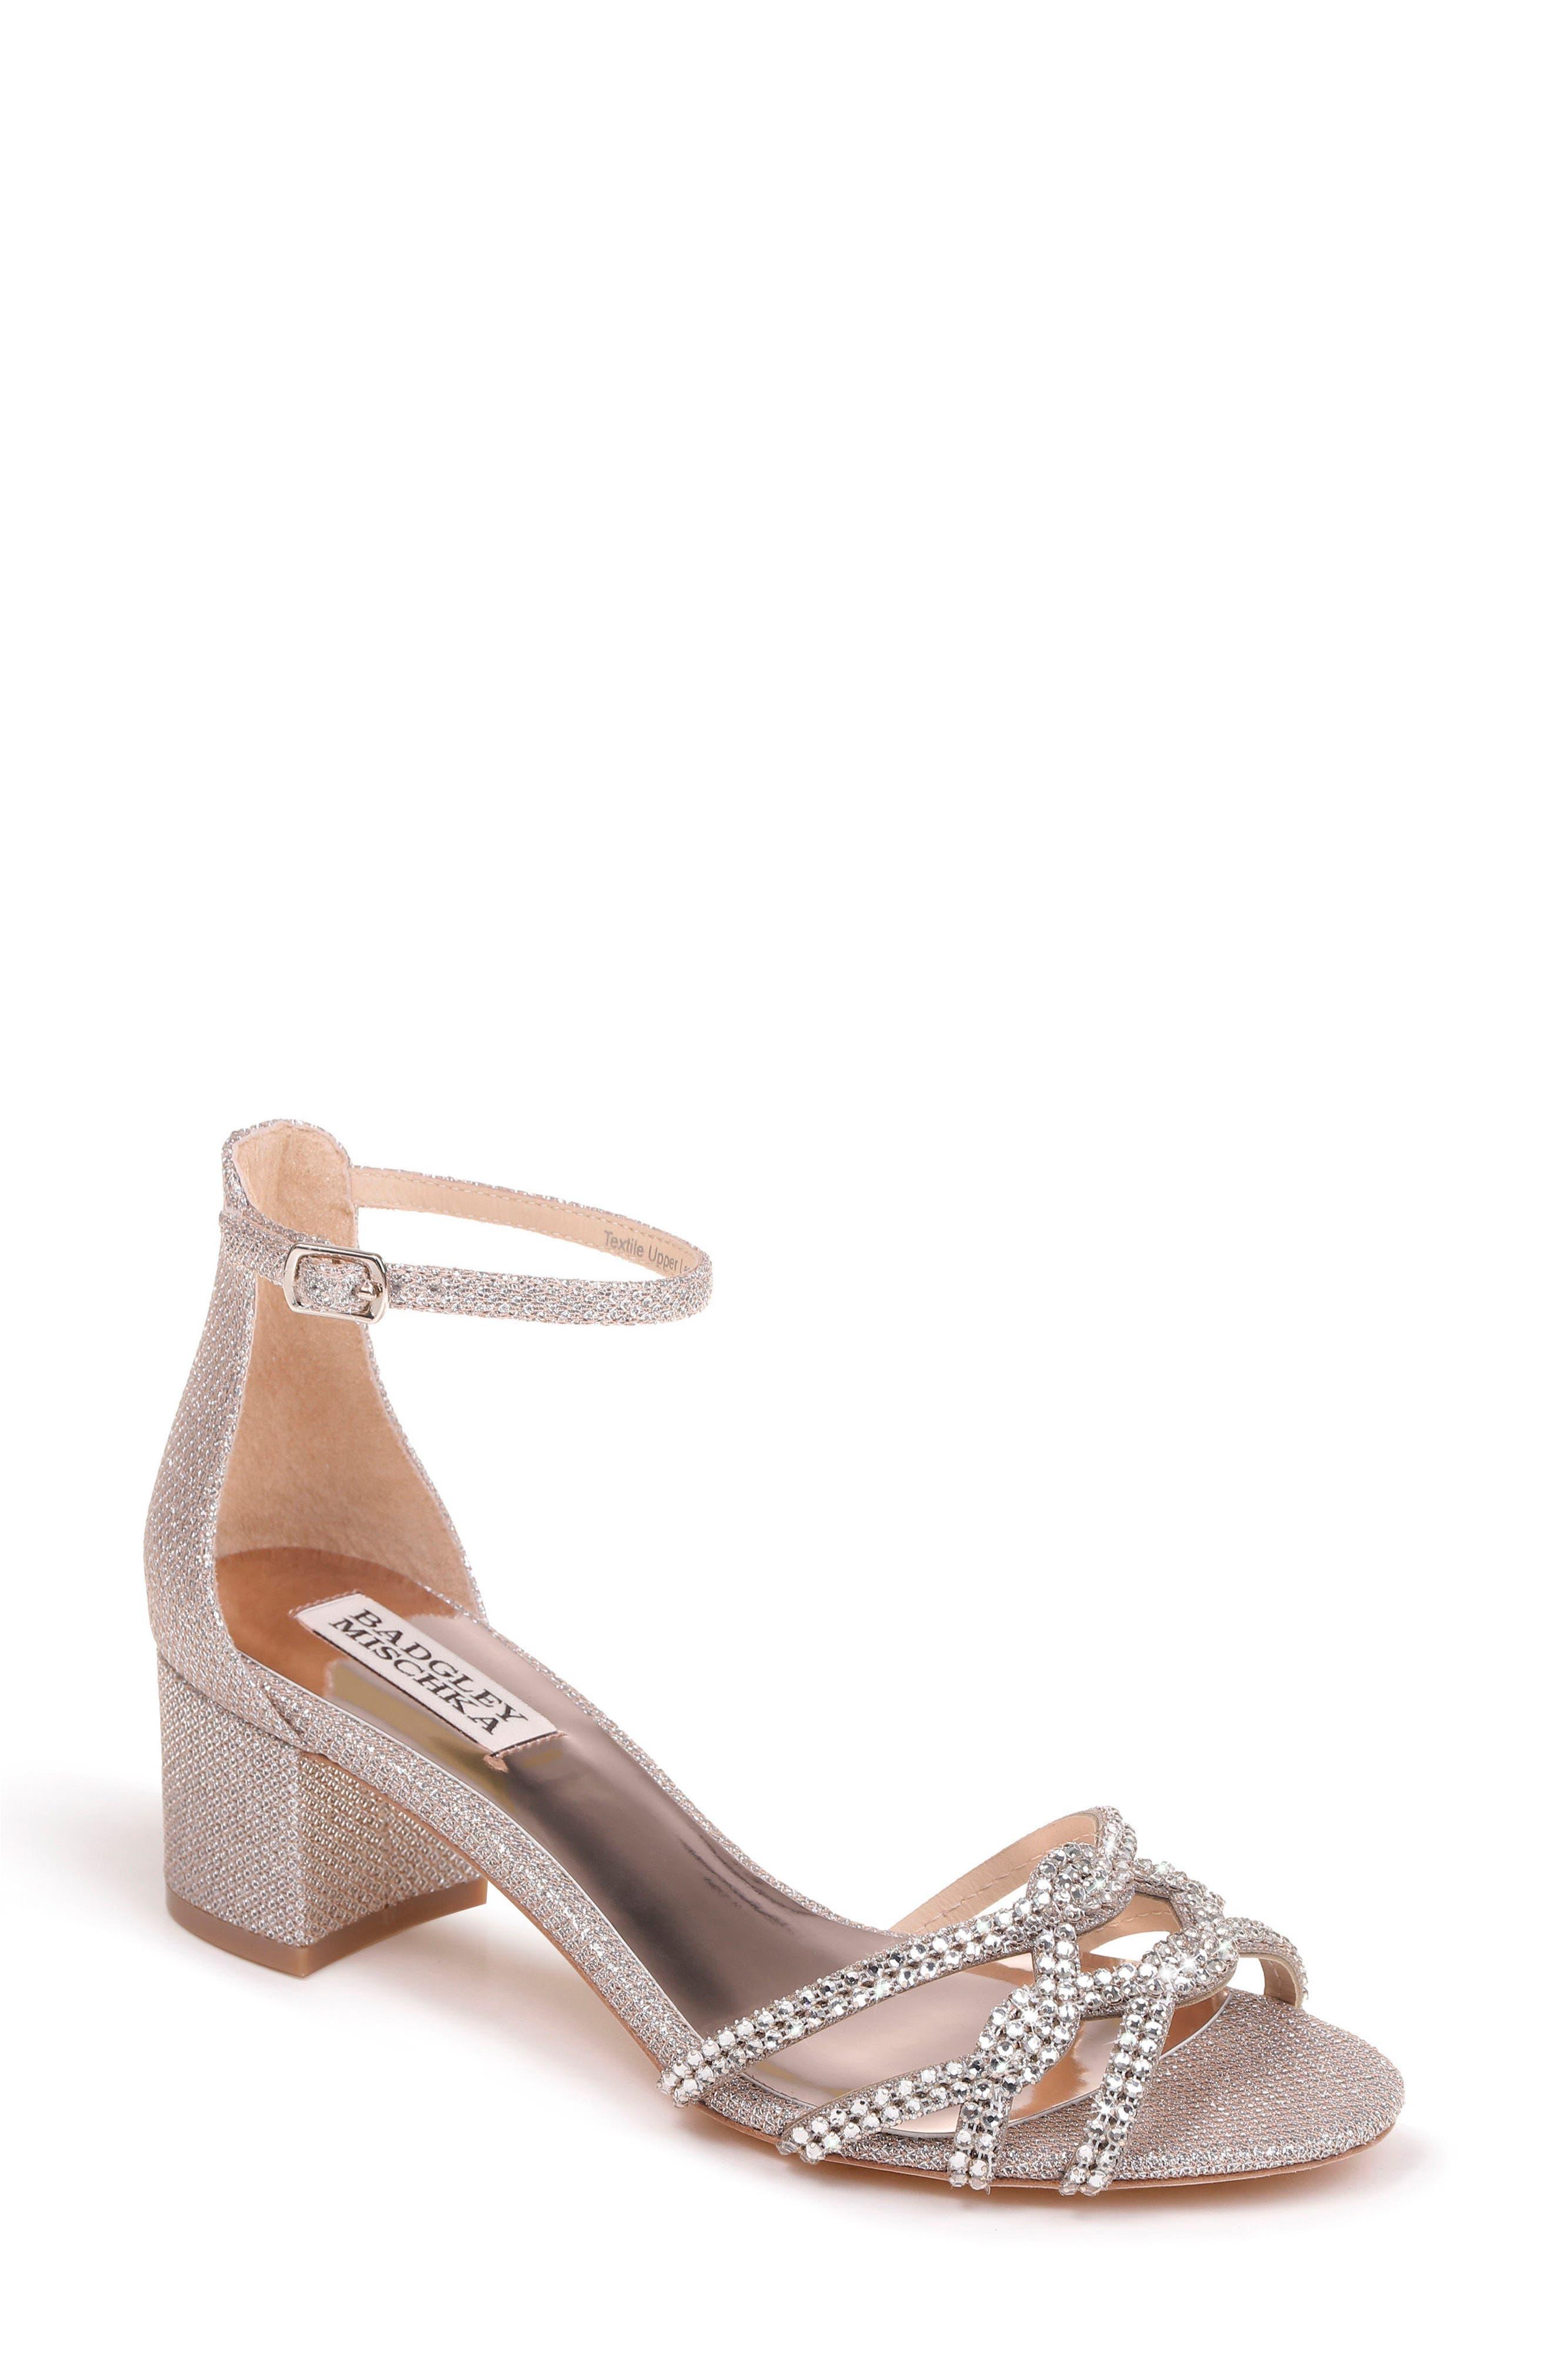 Alternate Image 1 Selected - Badgley Mischka Sonya Block Heel Sandal (Women)